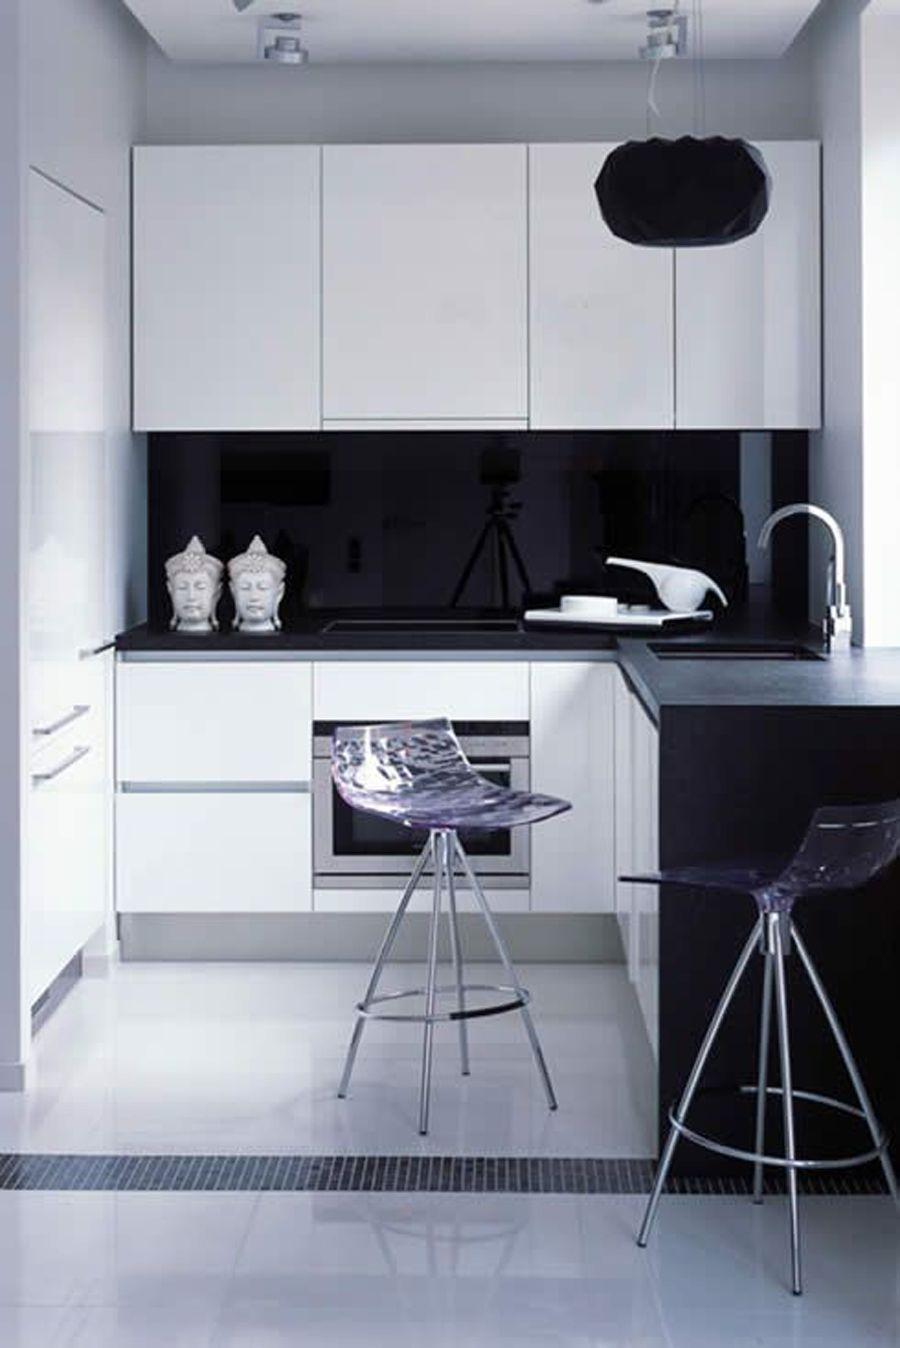 Siyah beyaz mutfak. Black and white kitchen. | Mutfak | Pinterest